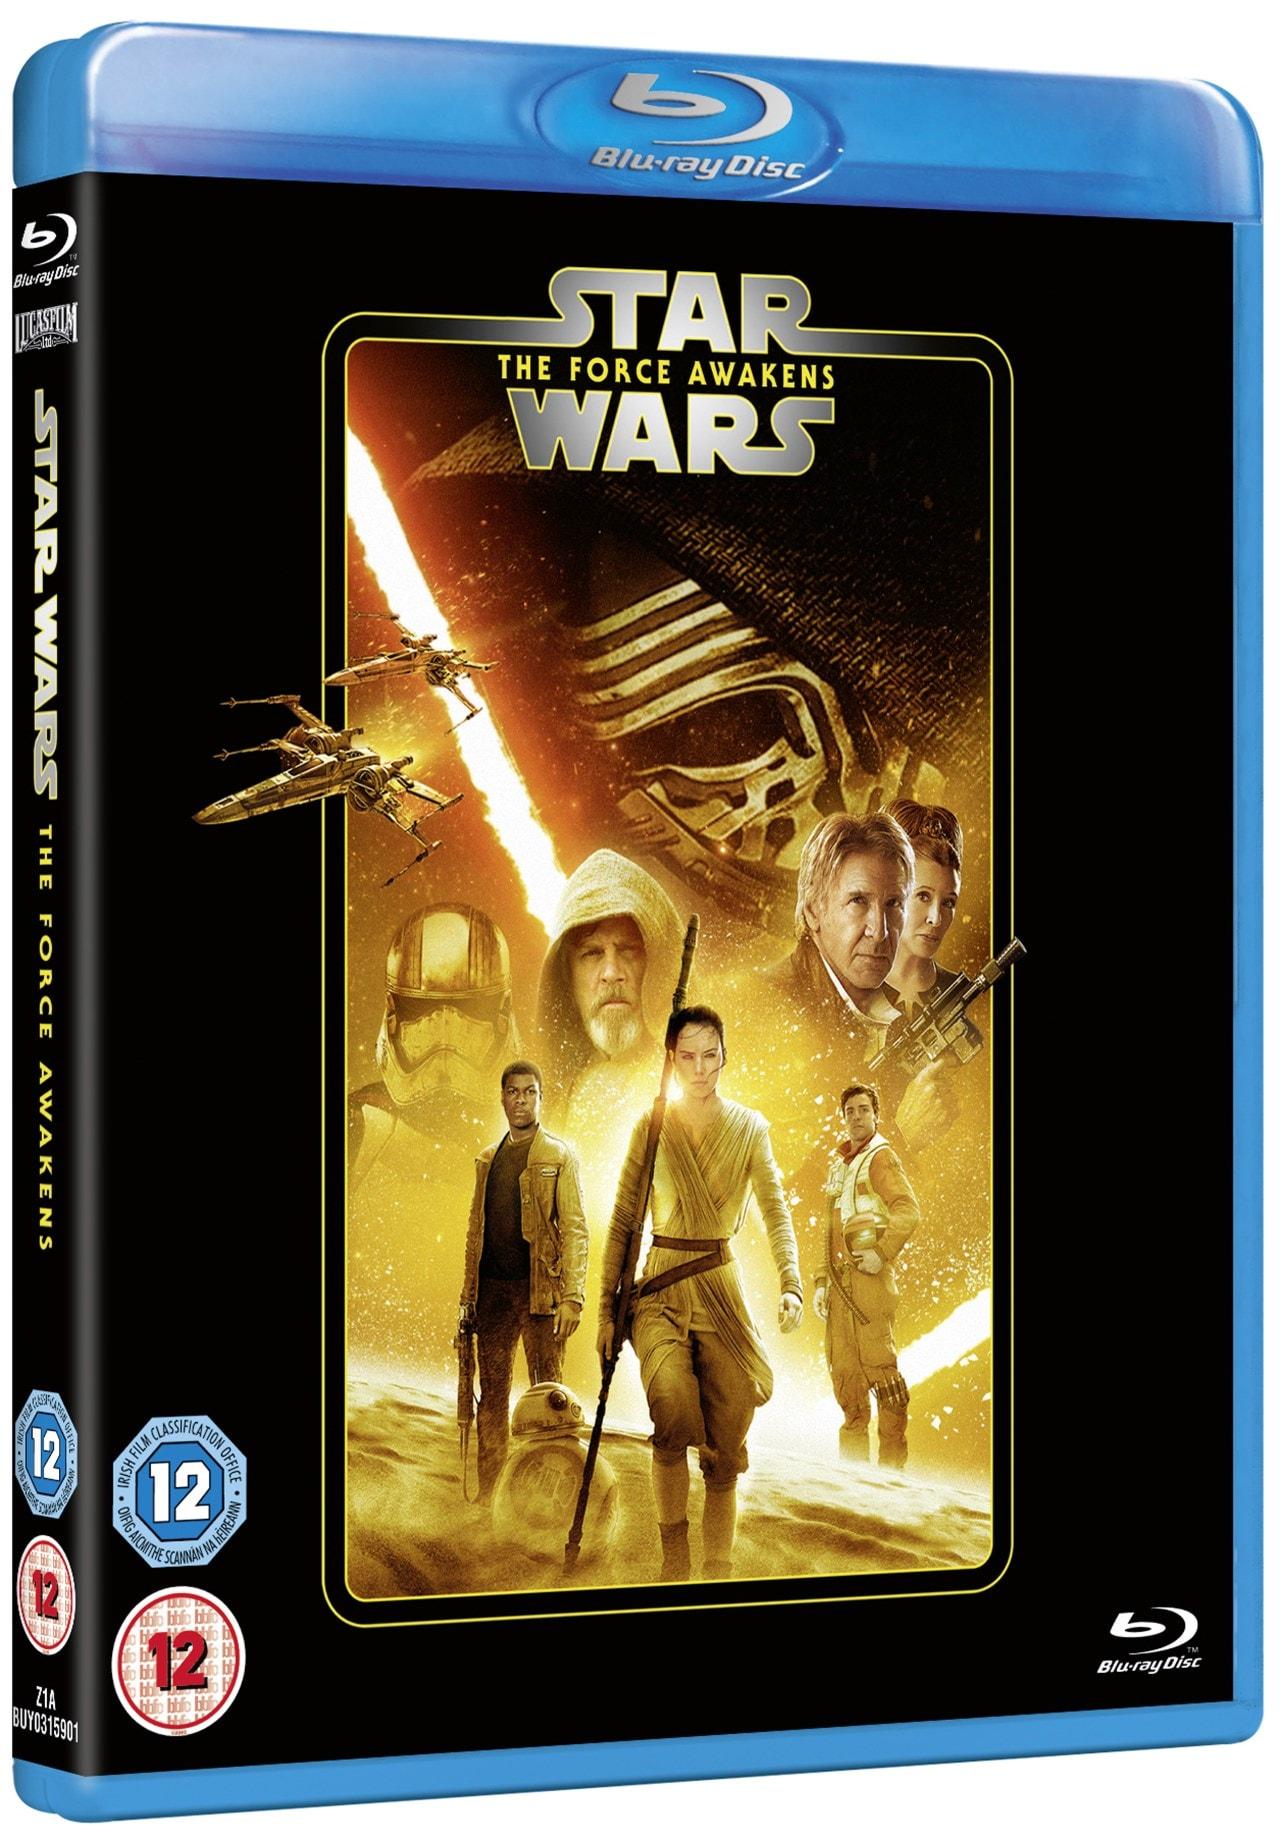 Star Wars: The Force Awakens - 2